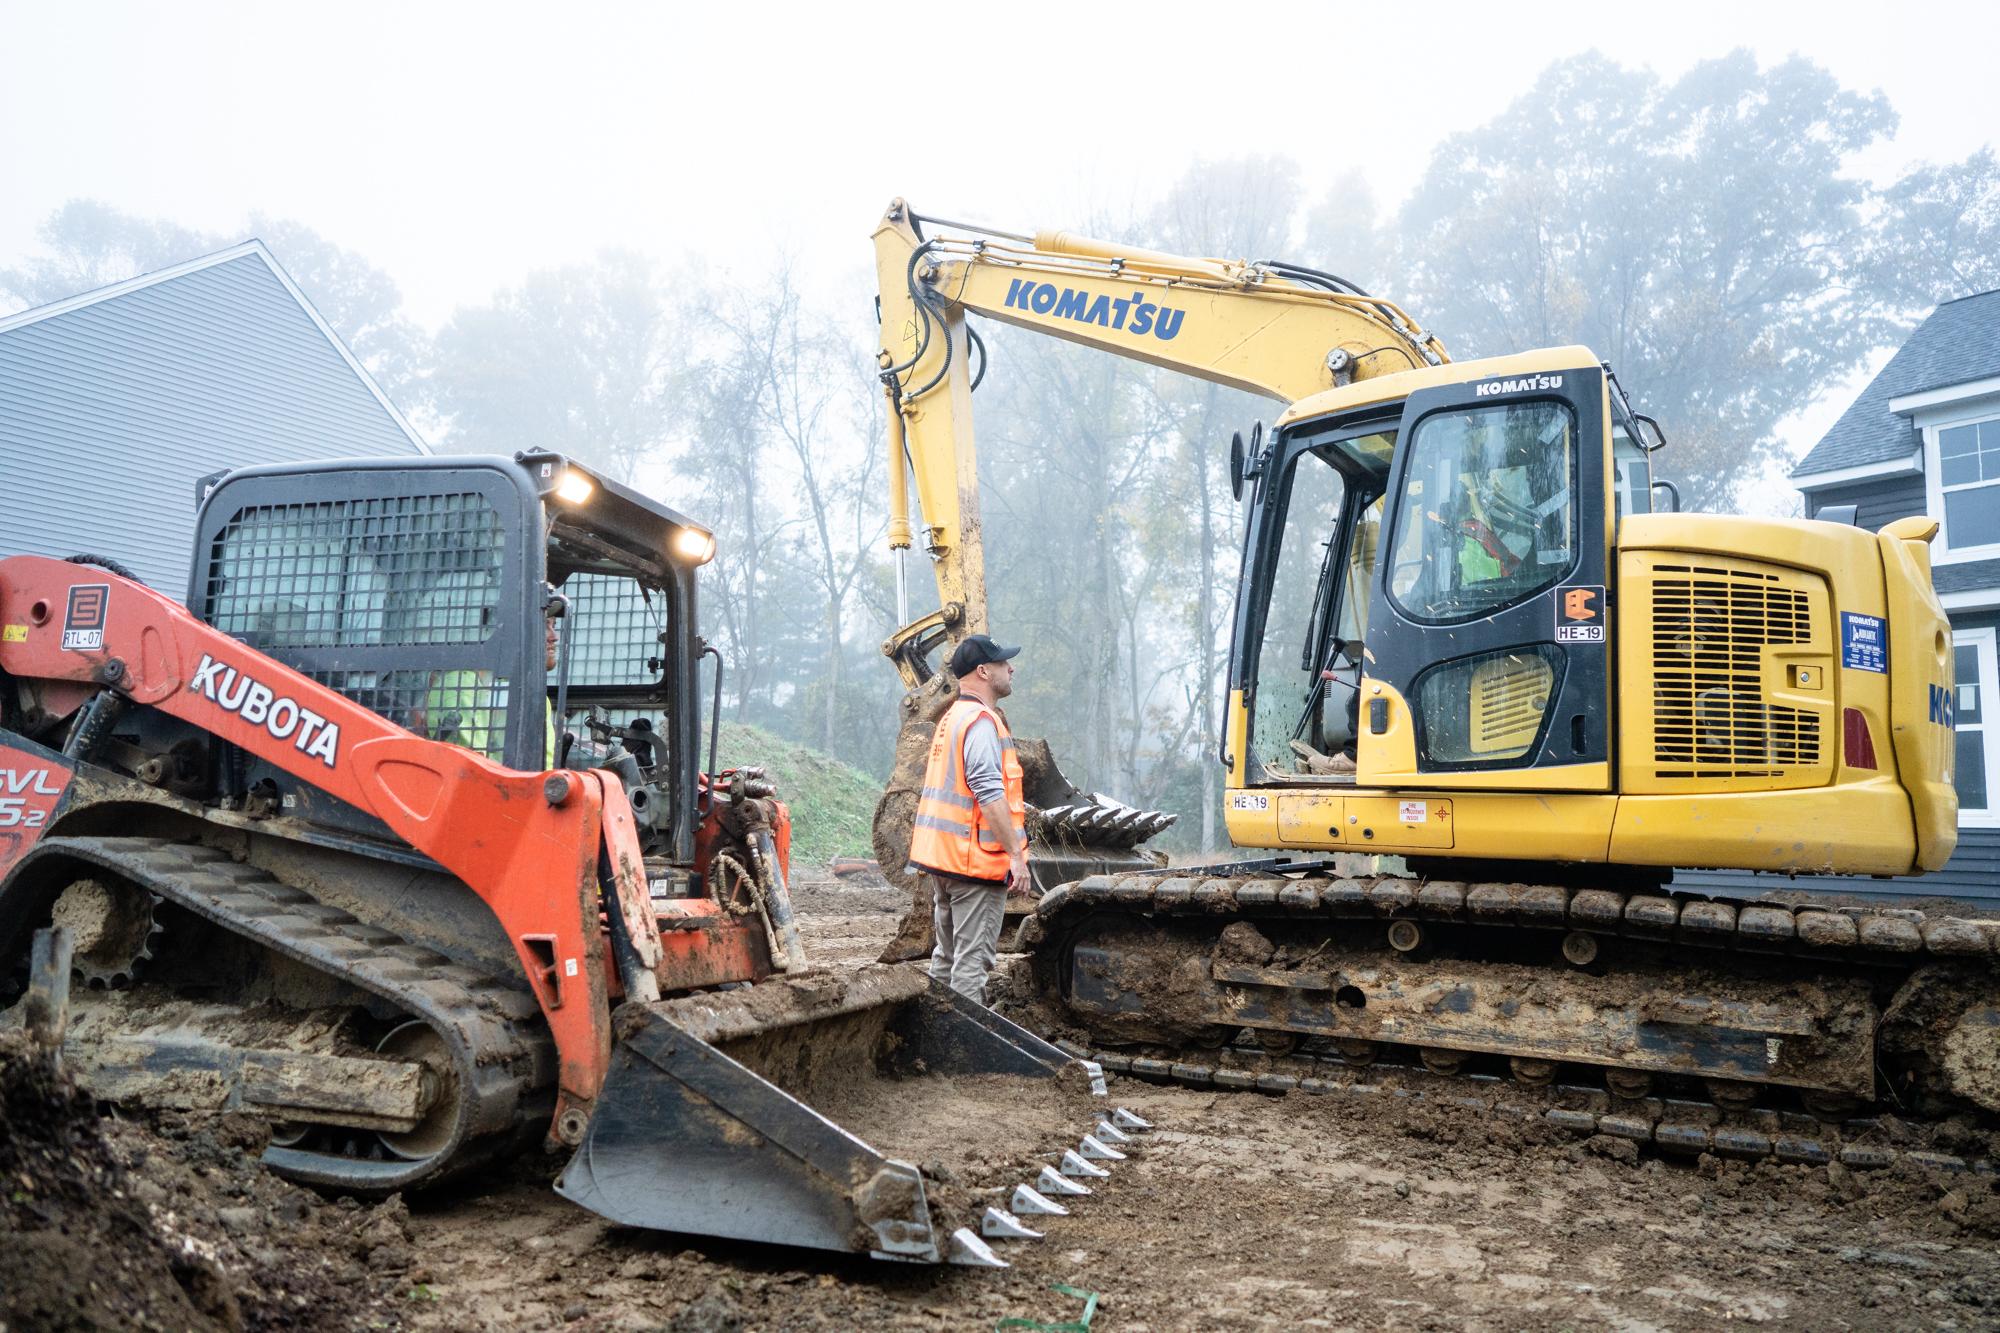 Berg Team Member Standing Between a Komatsu Excavator and Small Kubota Bulldozer at a Residential Work Site